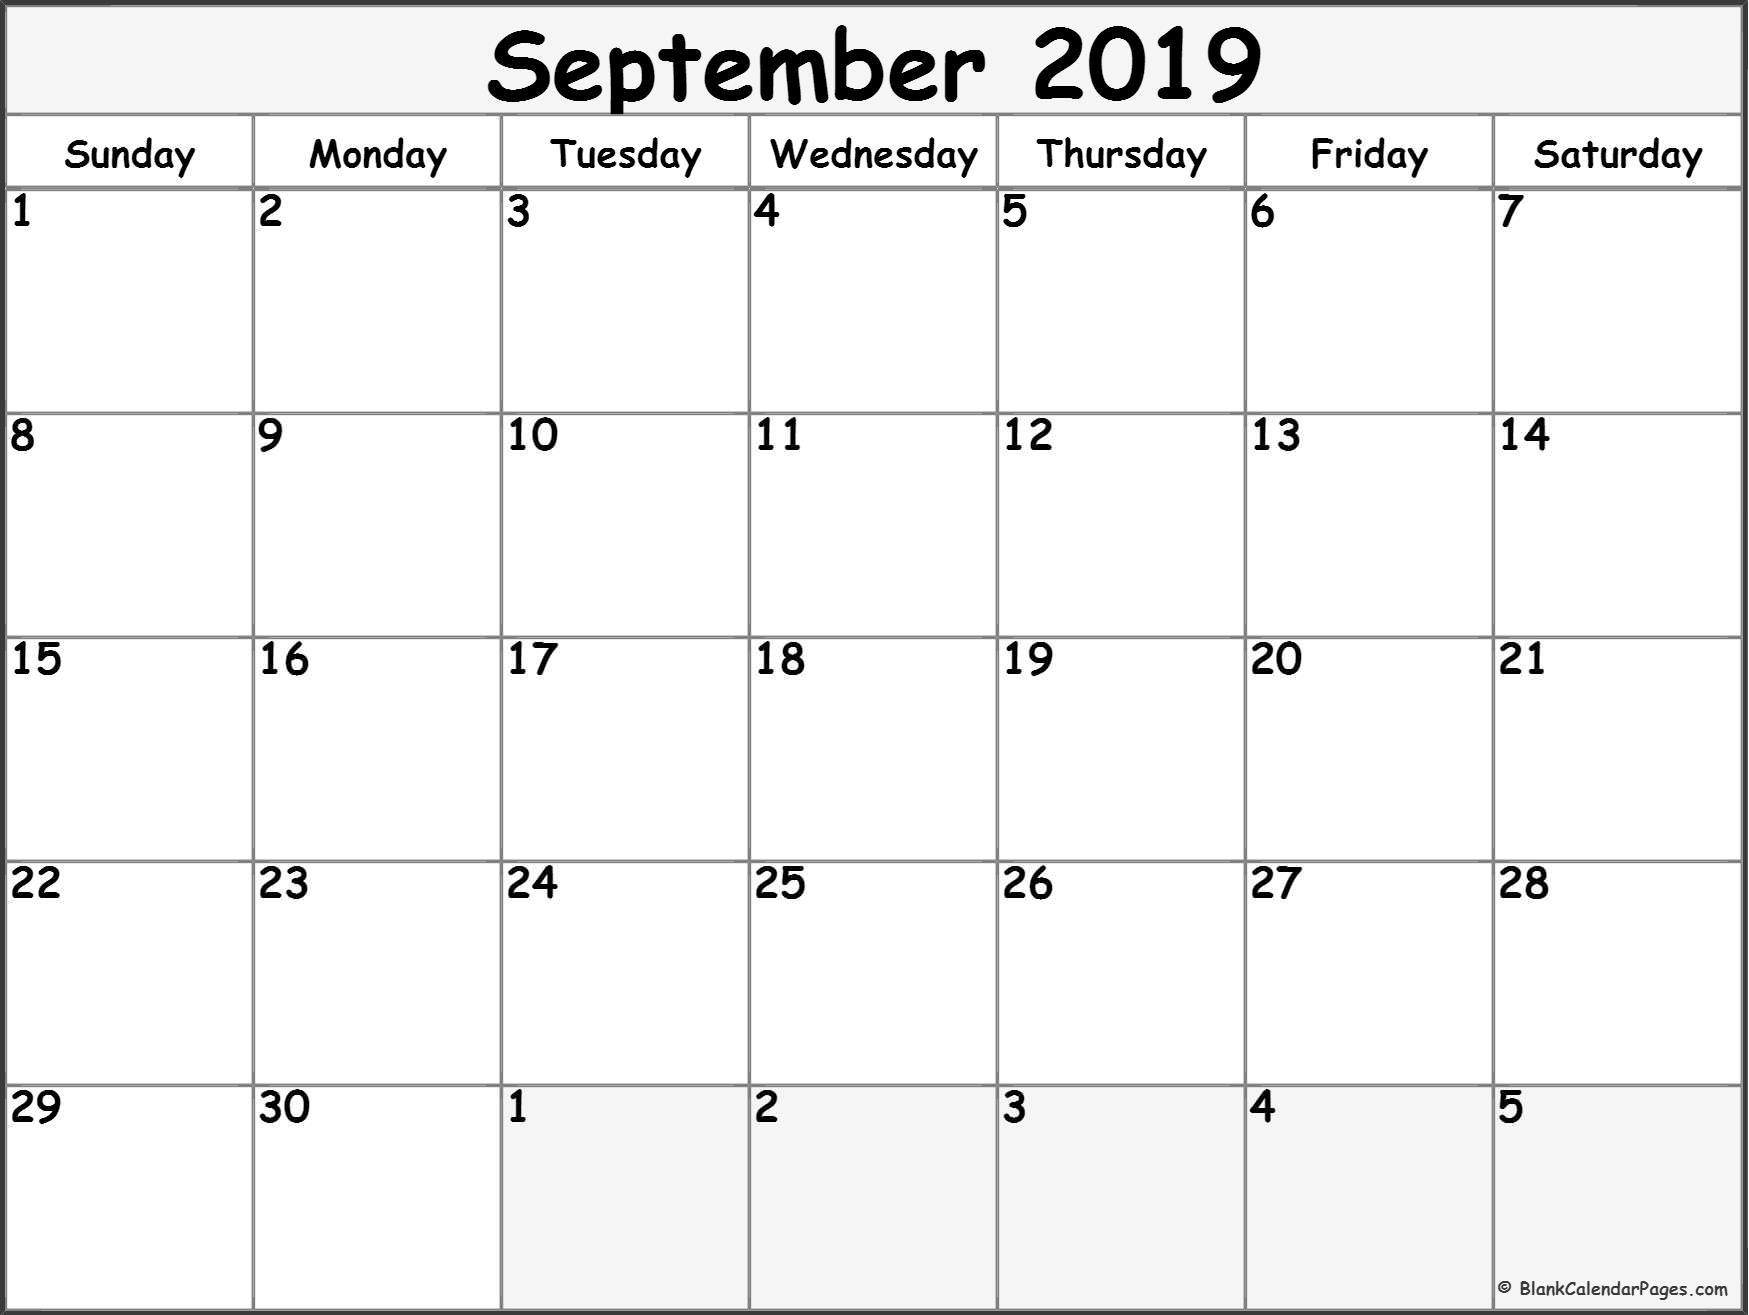 September 2019 Calendar   Free Printable Monthly Calendars for Blank Monthly Calendar September